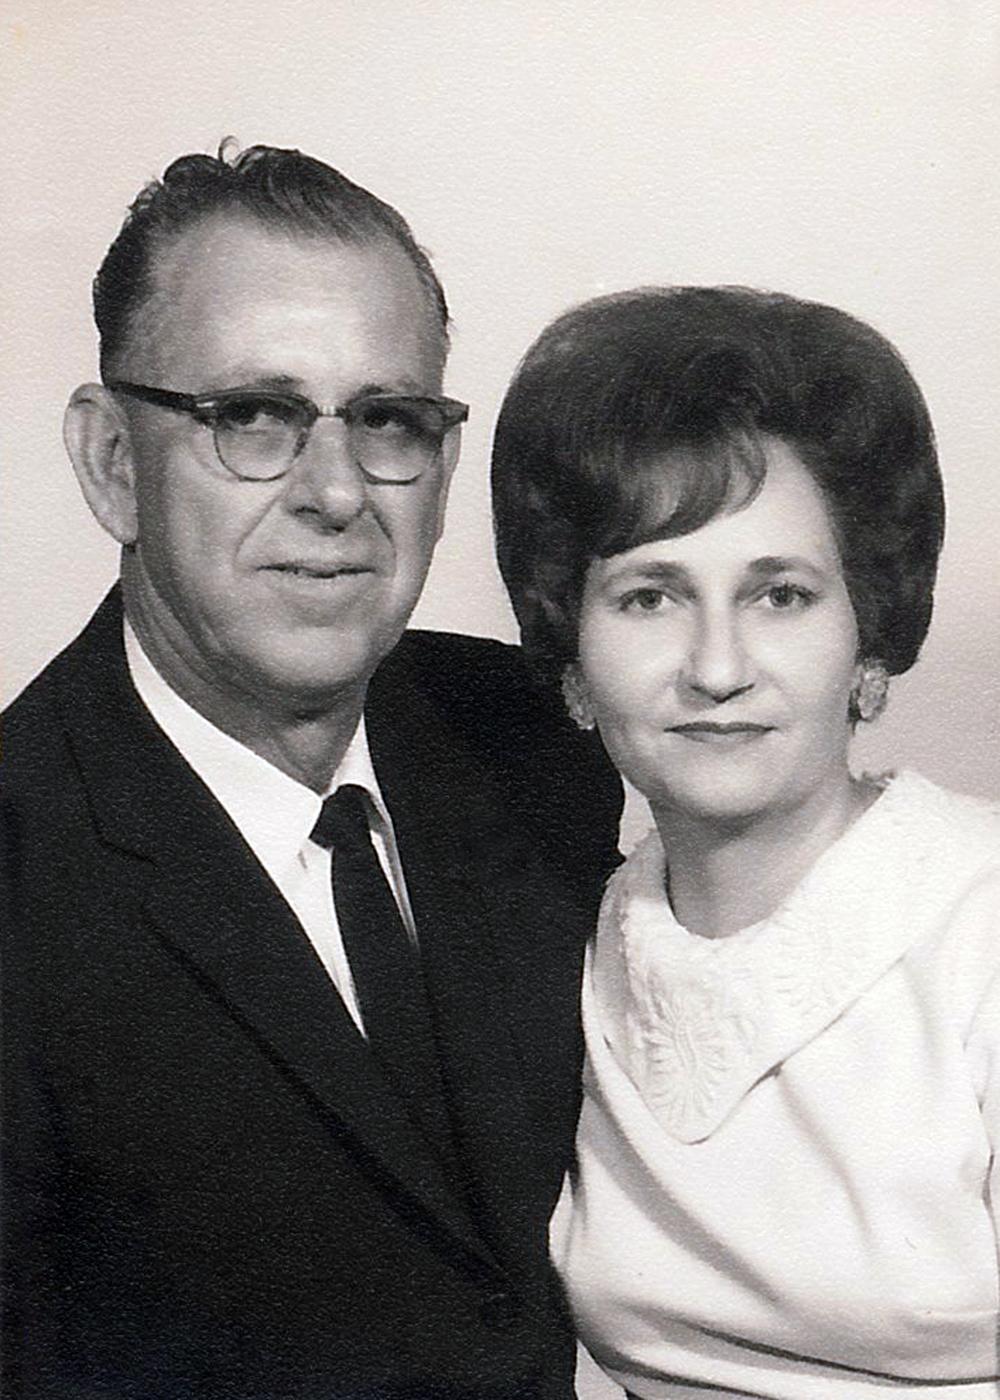 Clovis and Arletta Geno, Denise's parents.